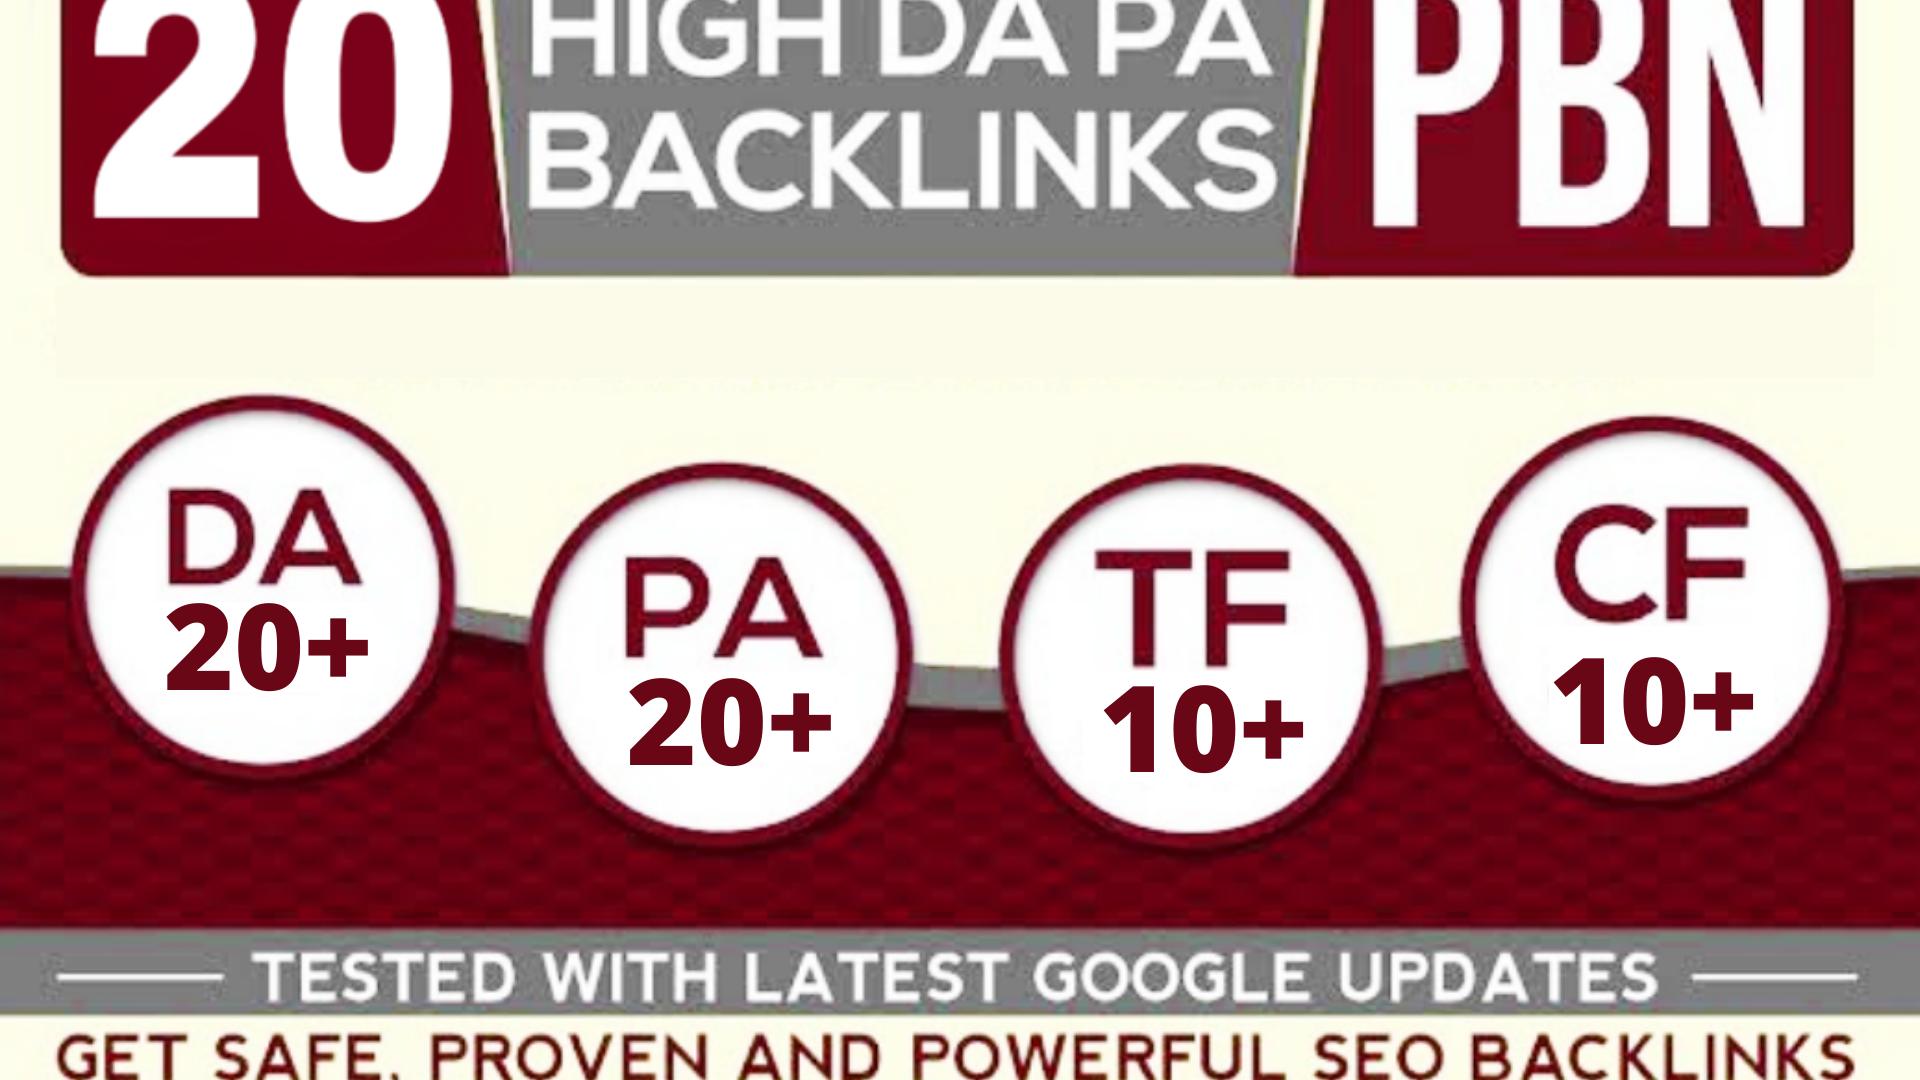 Get 20 powerful SEO permanent PBNs backlinks,  high DA 20+ HOMEPAGE